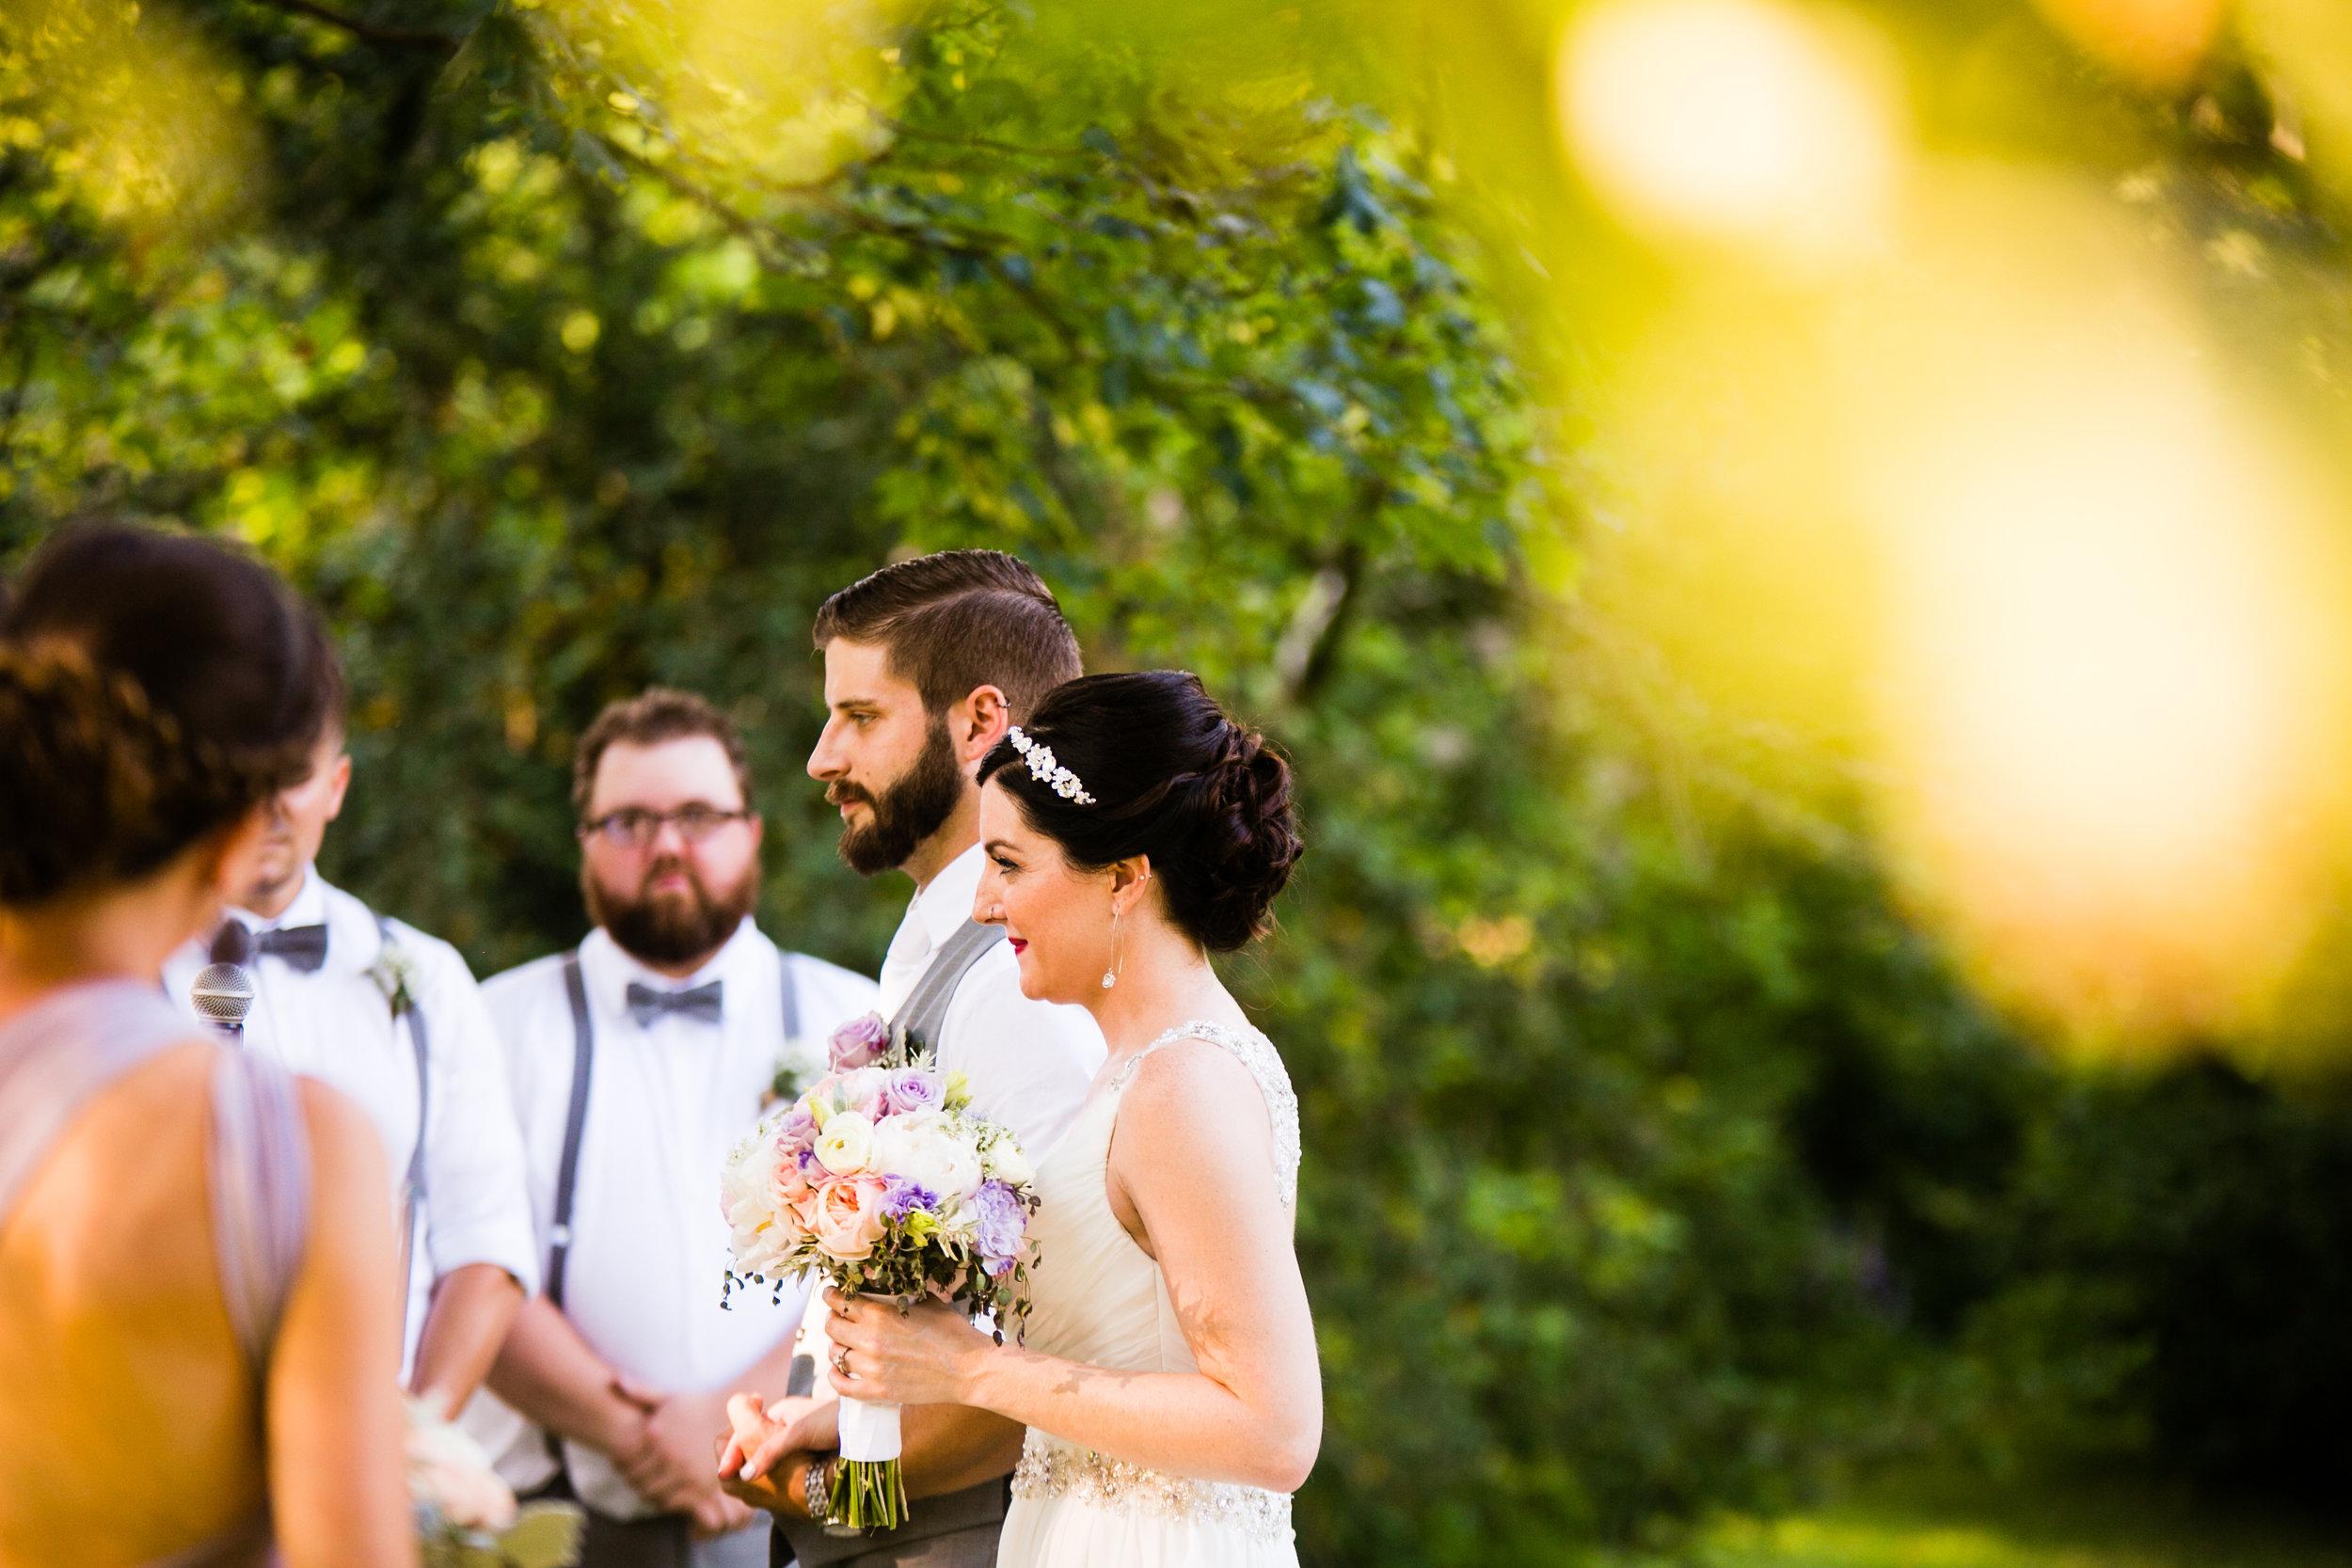 TYLER ARBORETUM WEDDING PHOTOGRAPHY LOVESTRUCK PICTURES-055.jpg